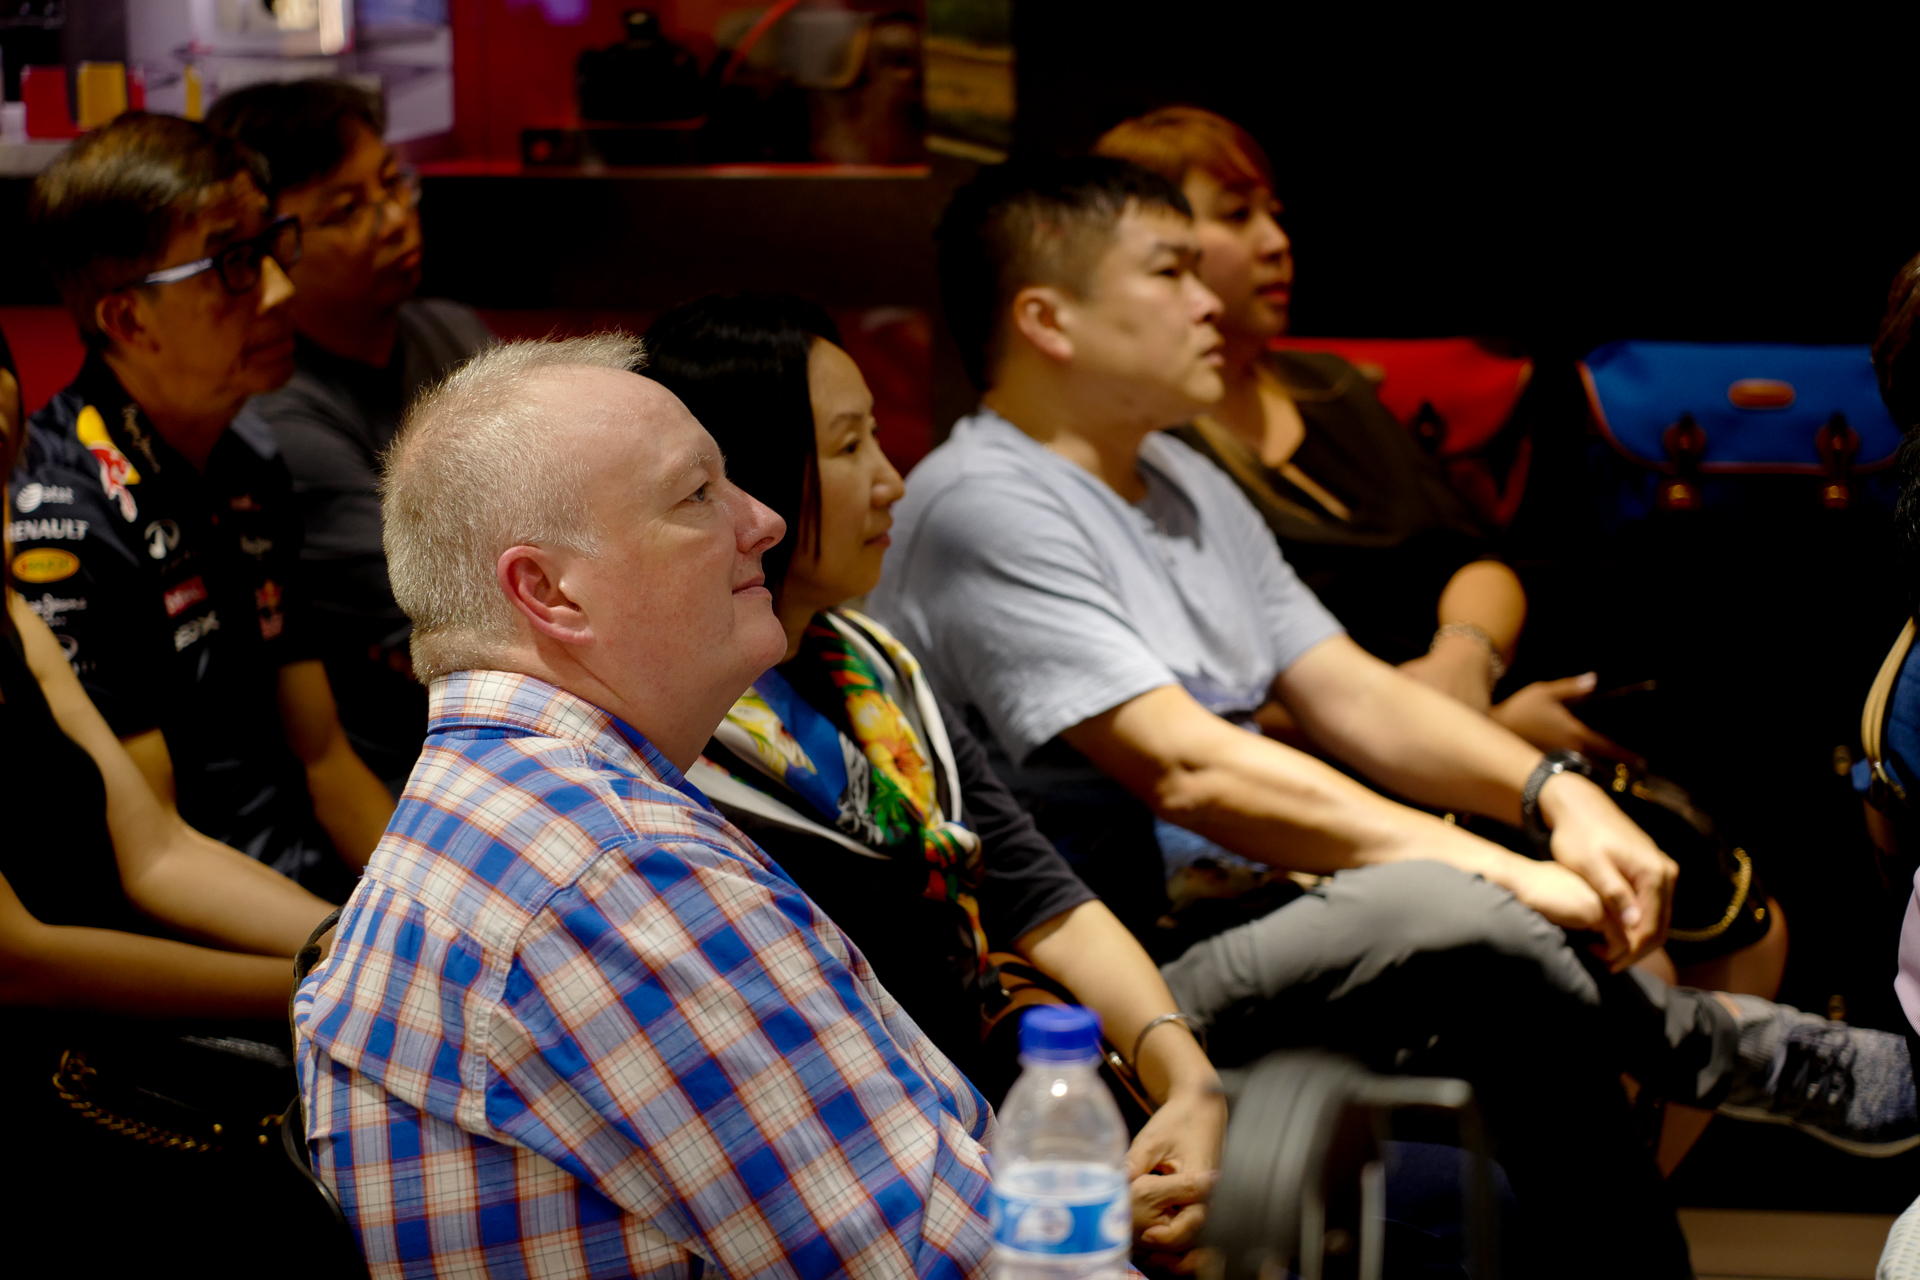 KC_Eng_Singapore_Photographer_L1060894 2.jpg